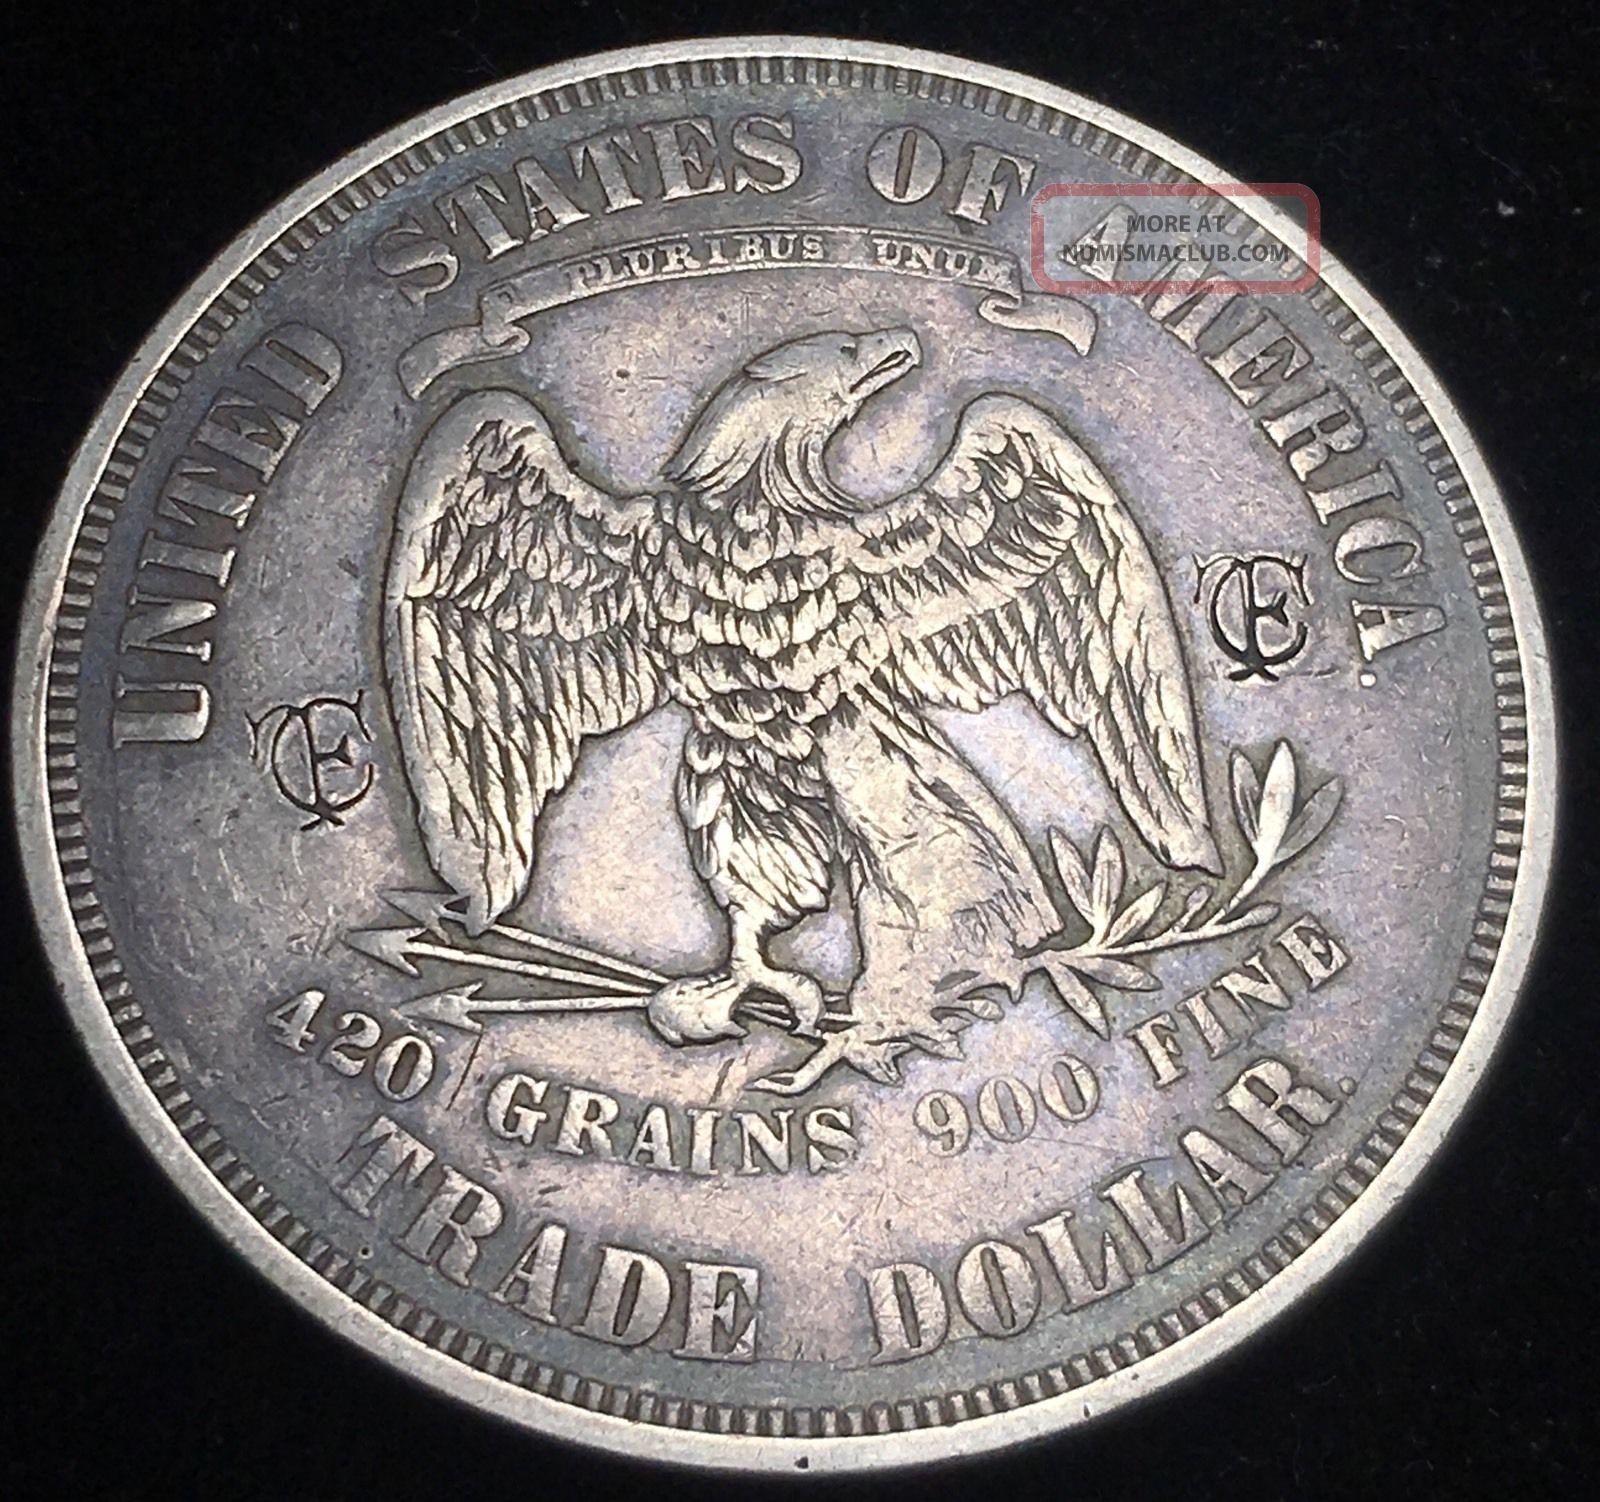 1874 Trade Dollar Silver Liberty $1 Rare U.  S Coin Dollars photo